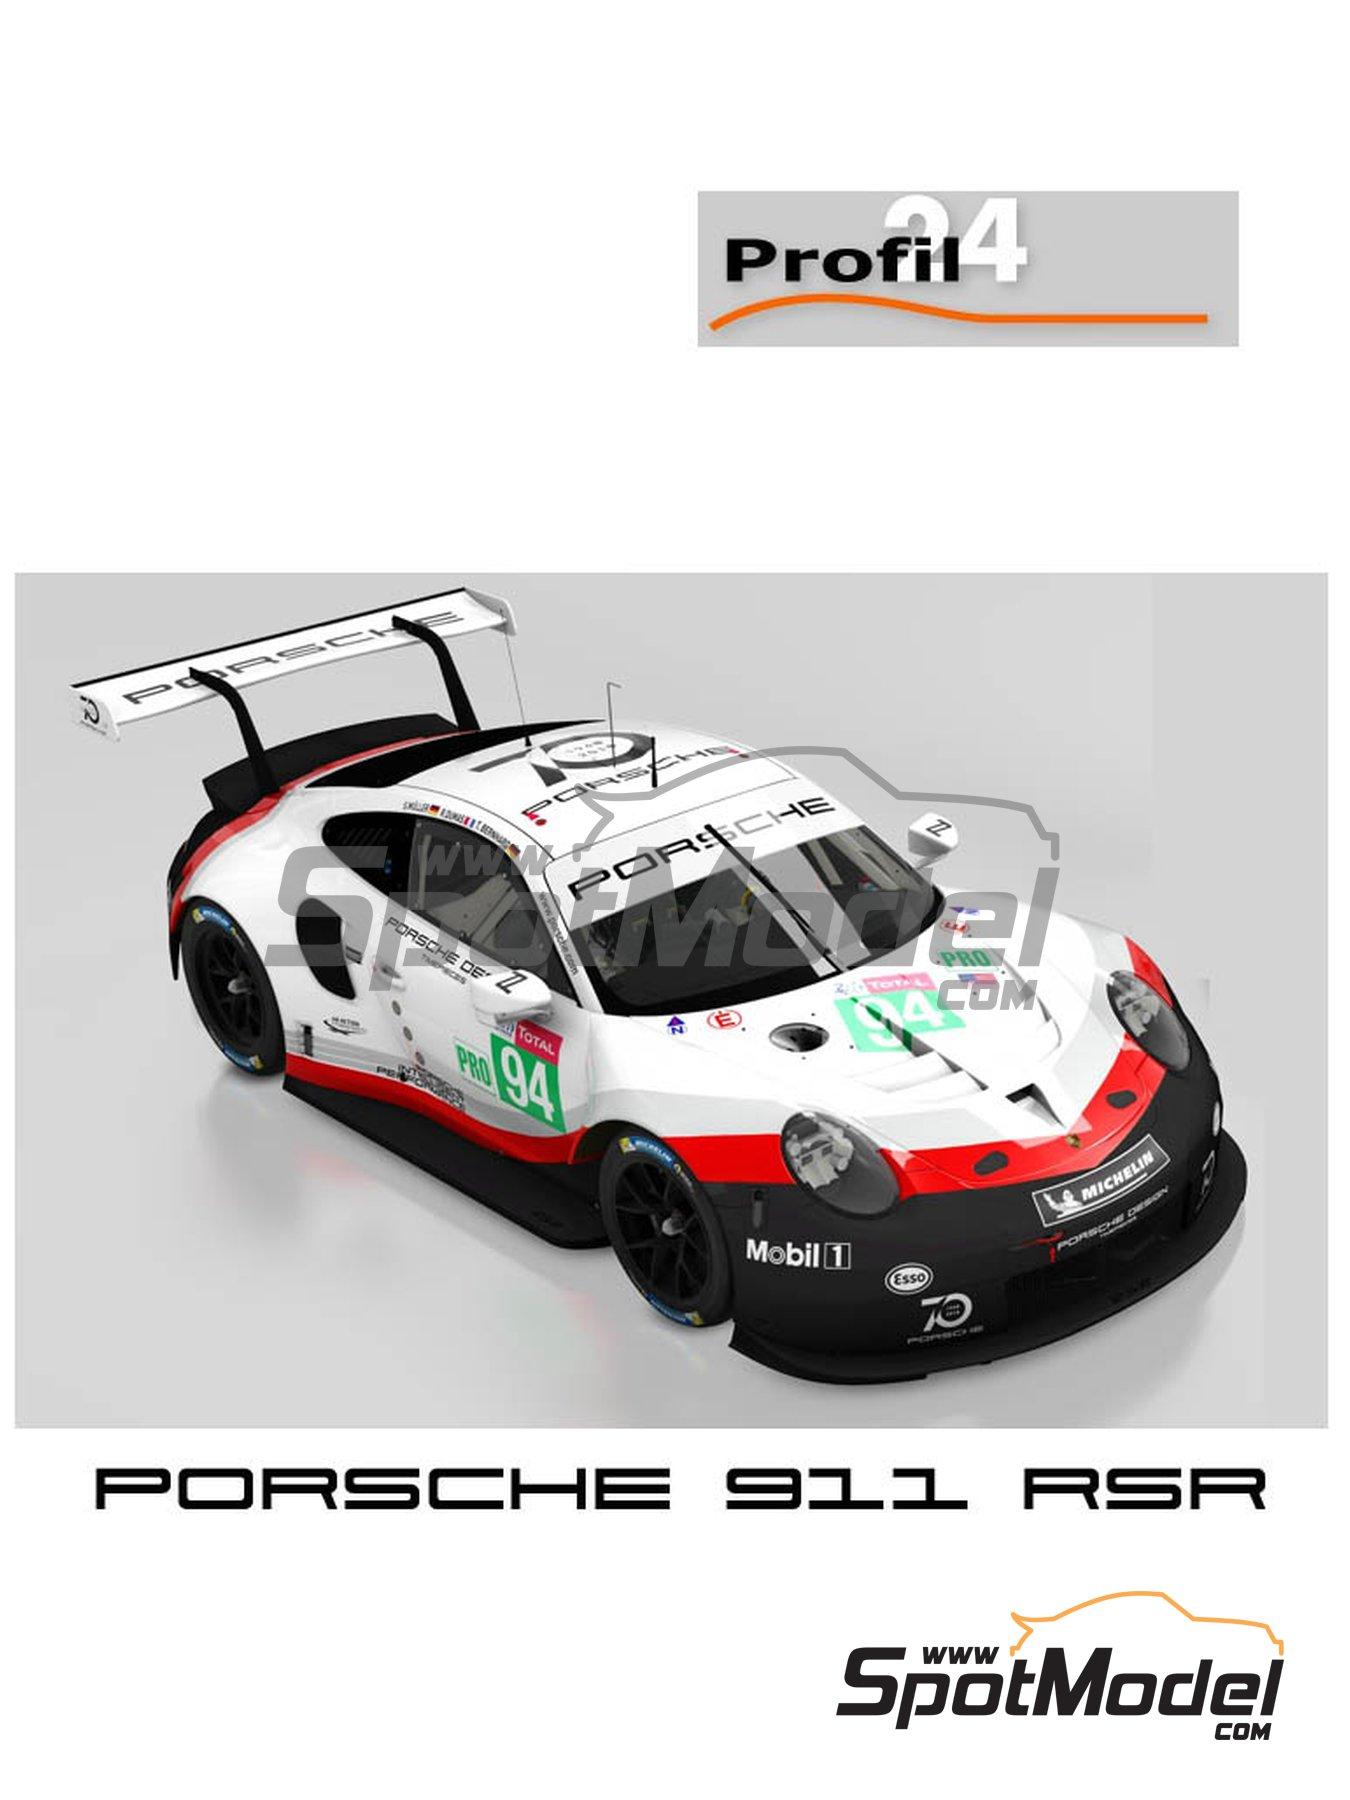 Porsche 911 RSR Porsche Motorsport GT Team - 24 Hours Le Mans 2018 | Model car kit in 1/24 scale manufactured by Profil24 (ref.P24110) image